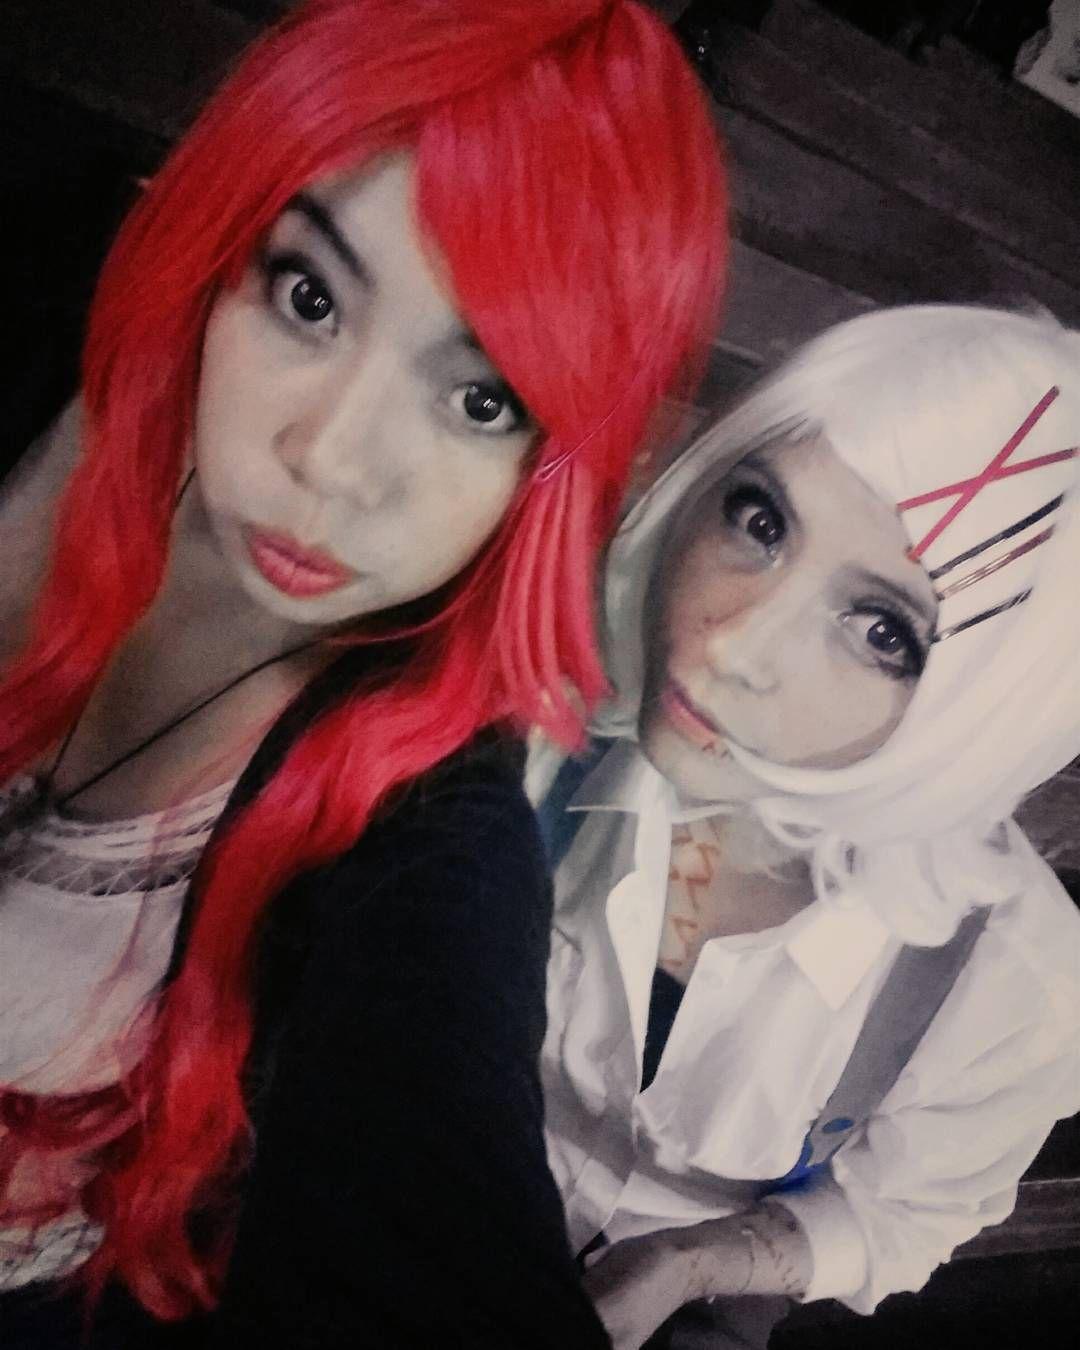 Fujoshi fest Junto a Juzo Hanna adore tu crosplay  #ariel #tokyoghoul #juzo #juzosuzuya  #cosplayers #cosplay #crosslay# #kaneki #cute #selfie #animecosplay #animegirl